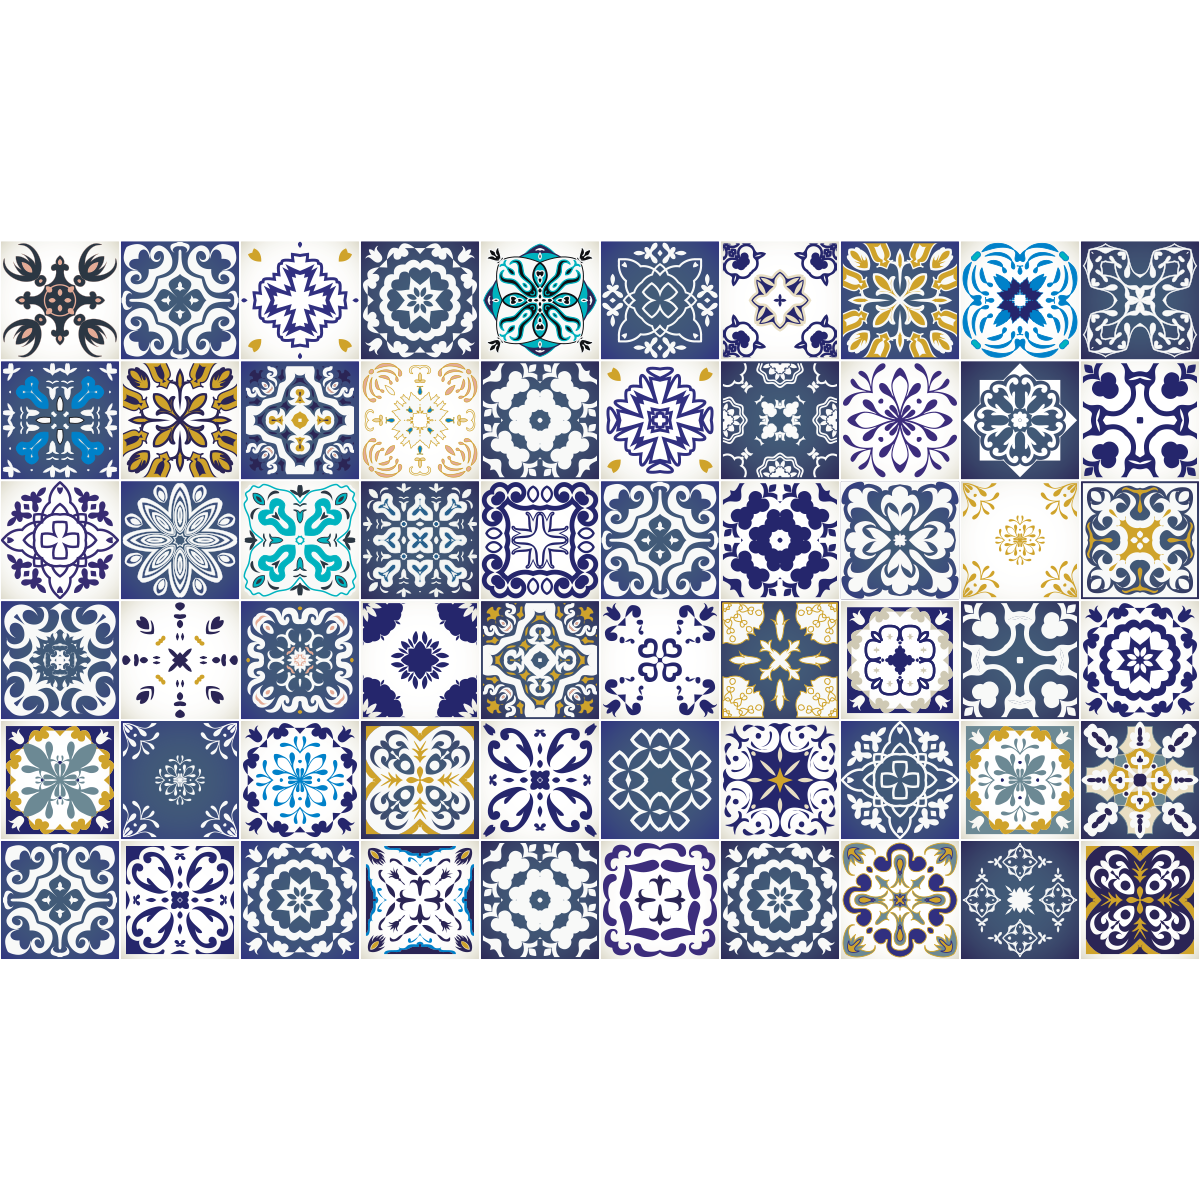 60 stickers carrelages azulejos cyprus salle de bain et wc salle de bain ambiance sticker. Black Bedroom Furniture Sets. Home Design Ideas